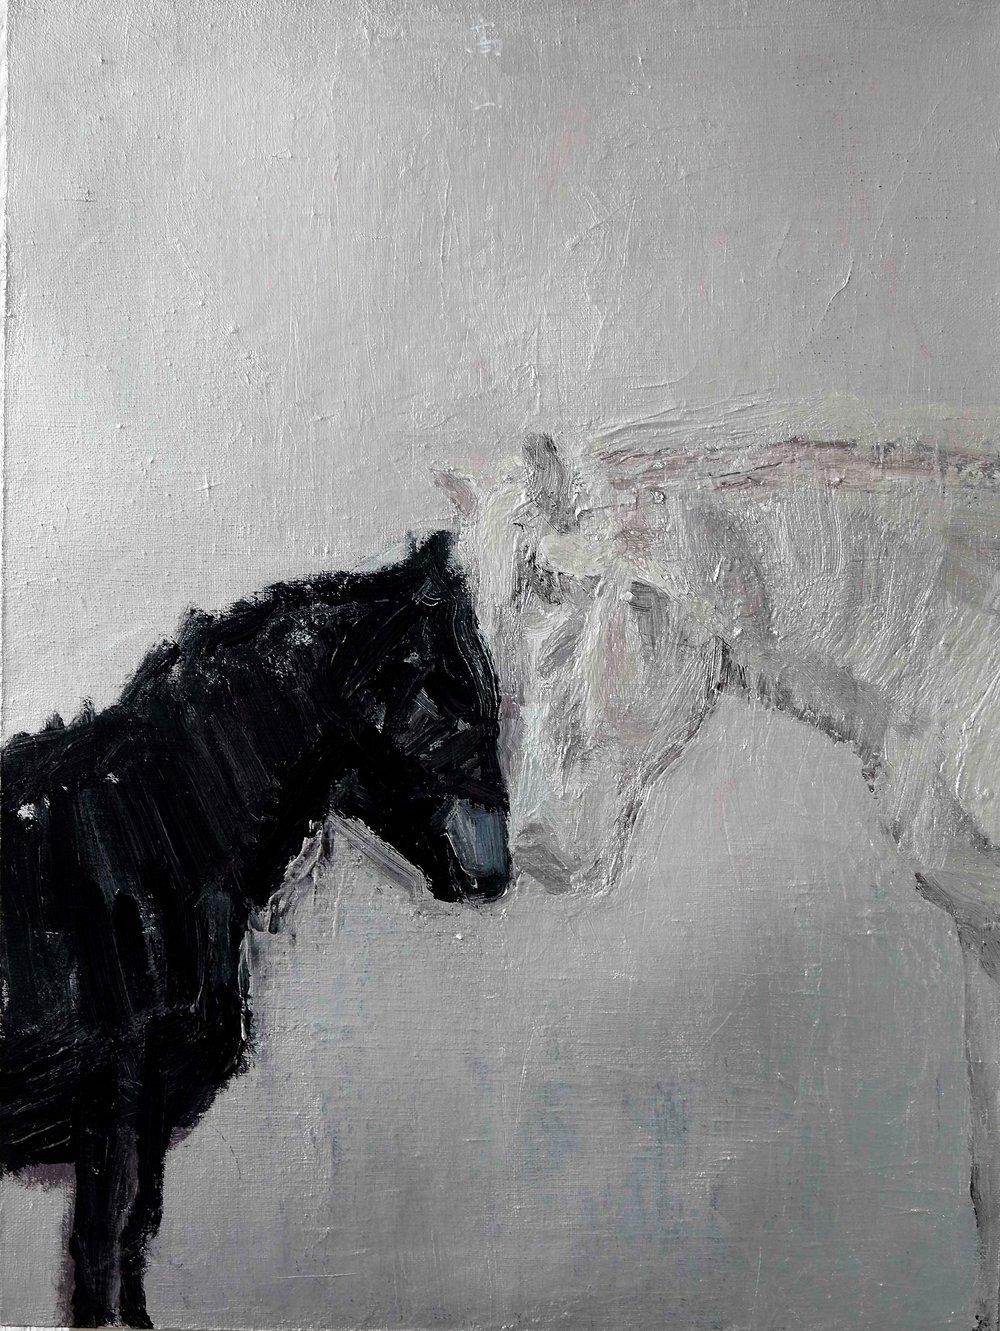 29. The Dreams   61 x 46 cm   Acrylic on Canvas  2014                      梦 布面丙烯.JPG